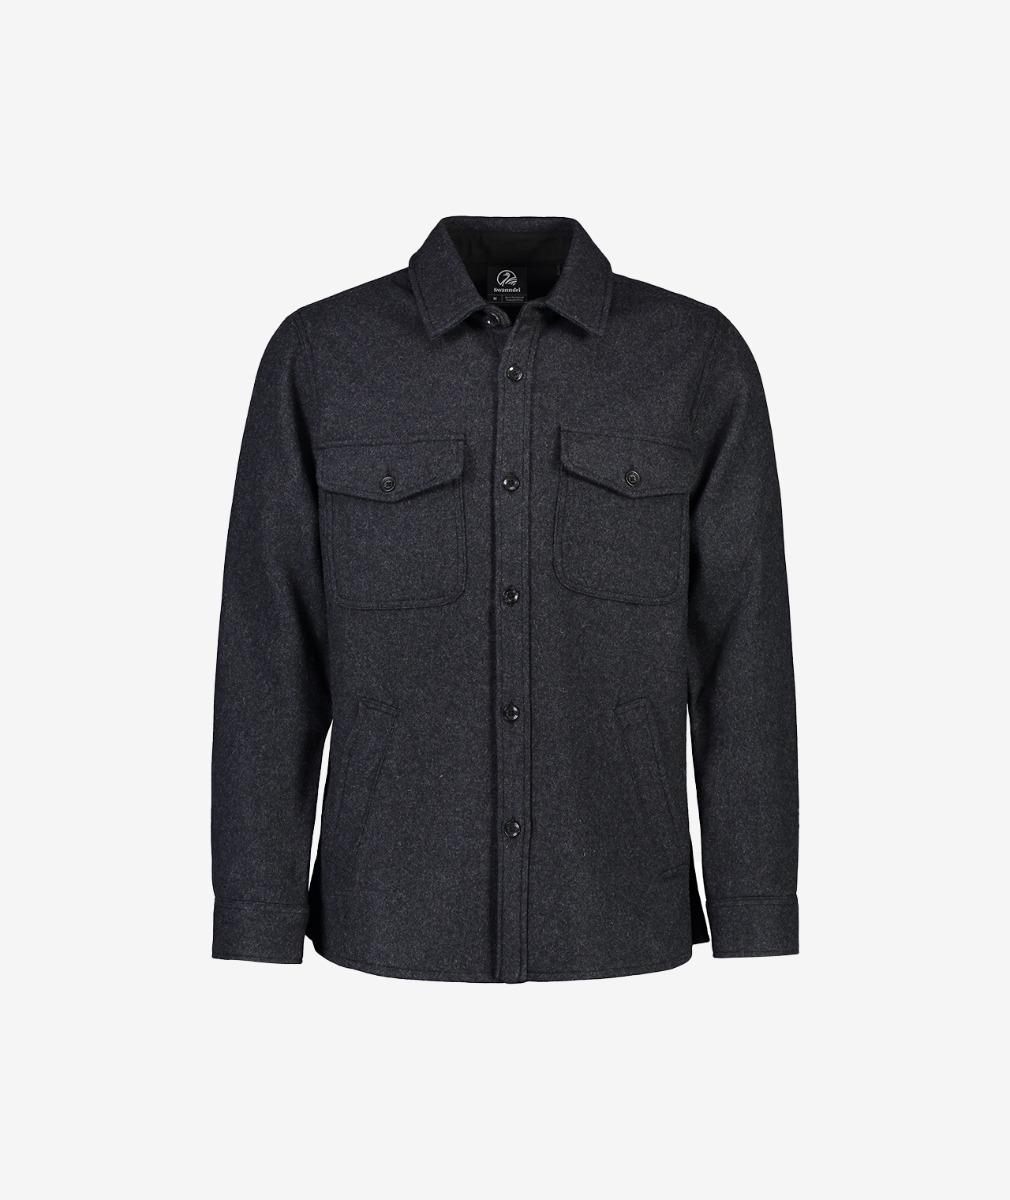 Swanndri Men's Kiaraki Merino Wool Shacket - Limited Edition Charcoal Check